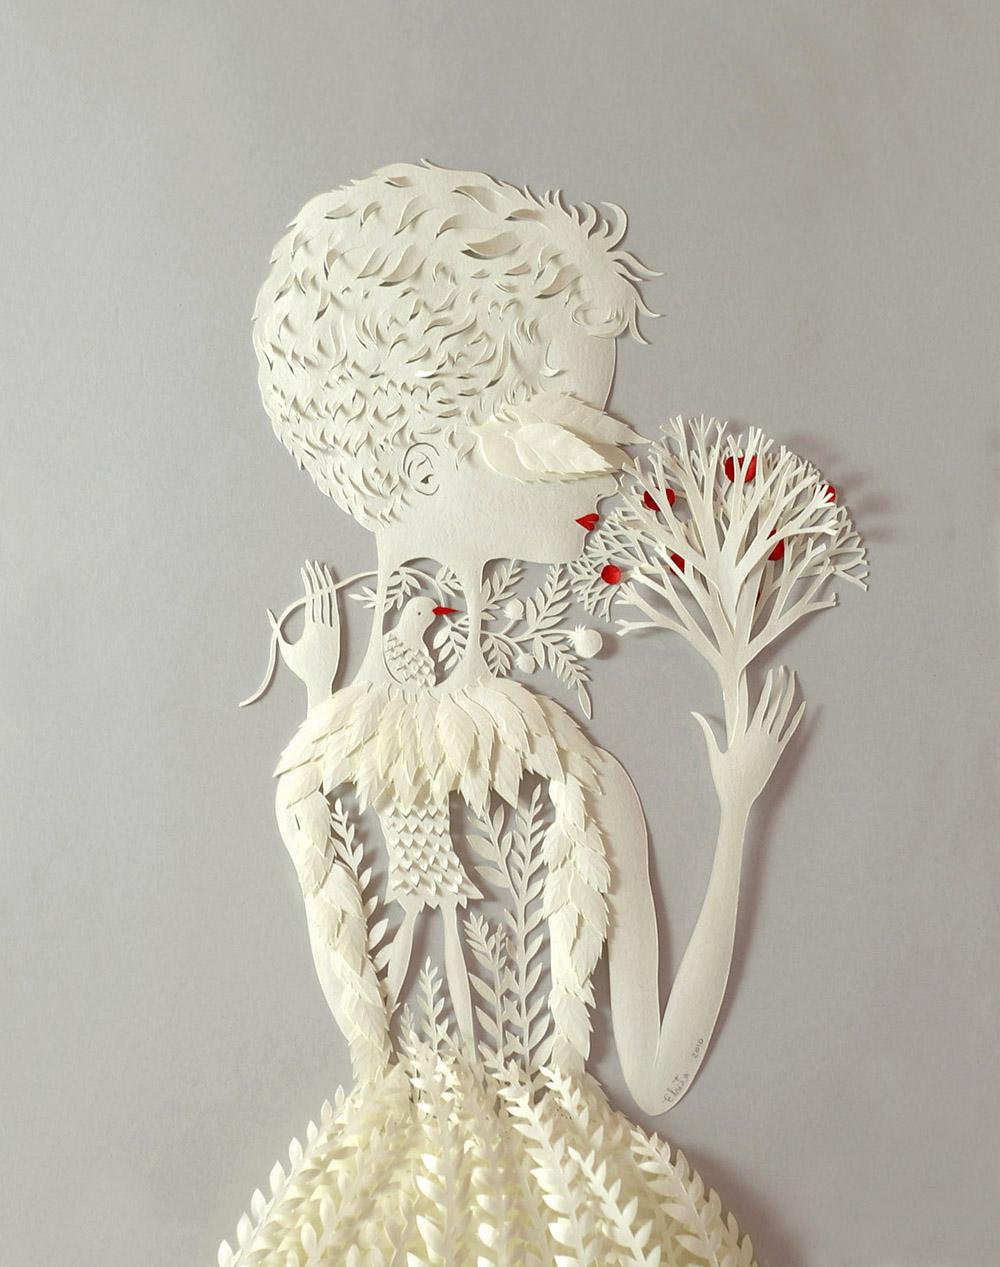 Por Dentro. Paper Sculpture by Elsa Mora